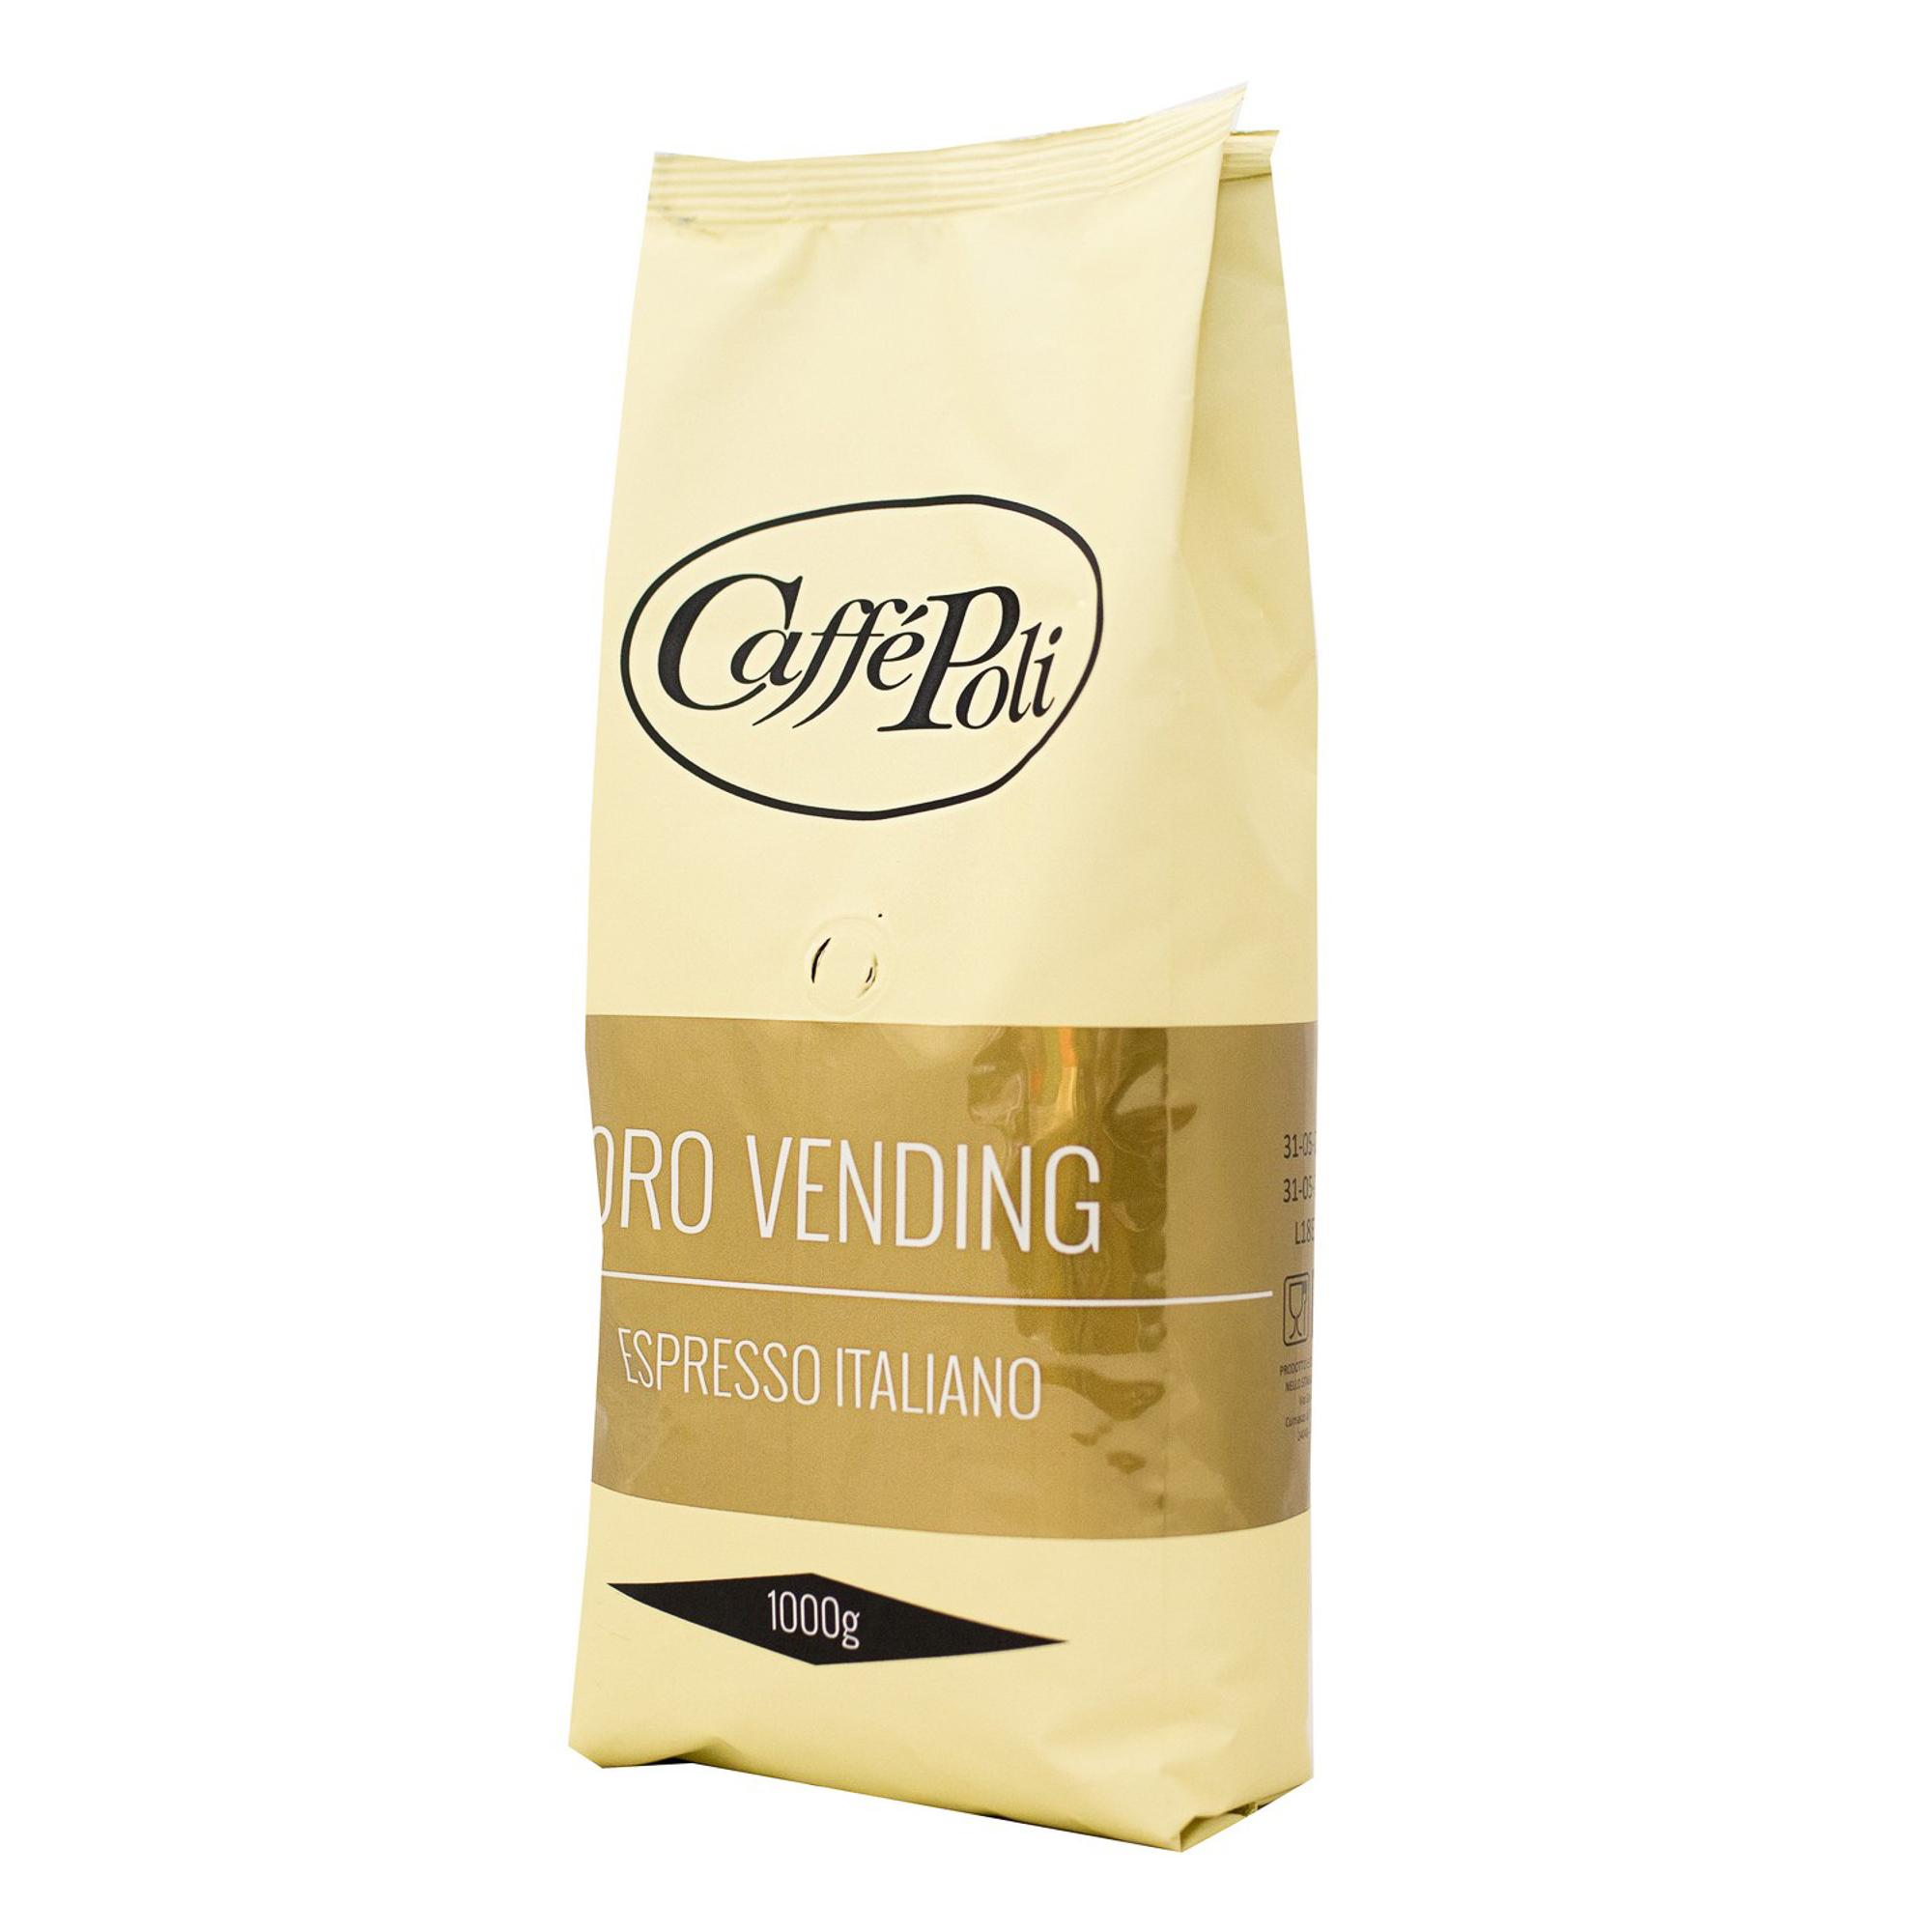 Кофе в зернах Caffe Poli Oro Vending 1 кг кофе в зернах piazza del caffe